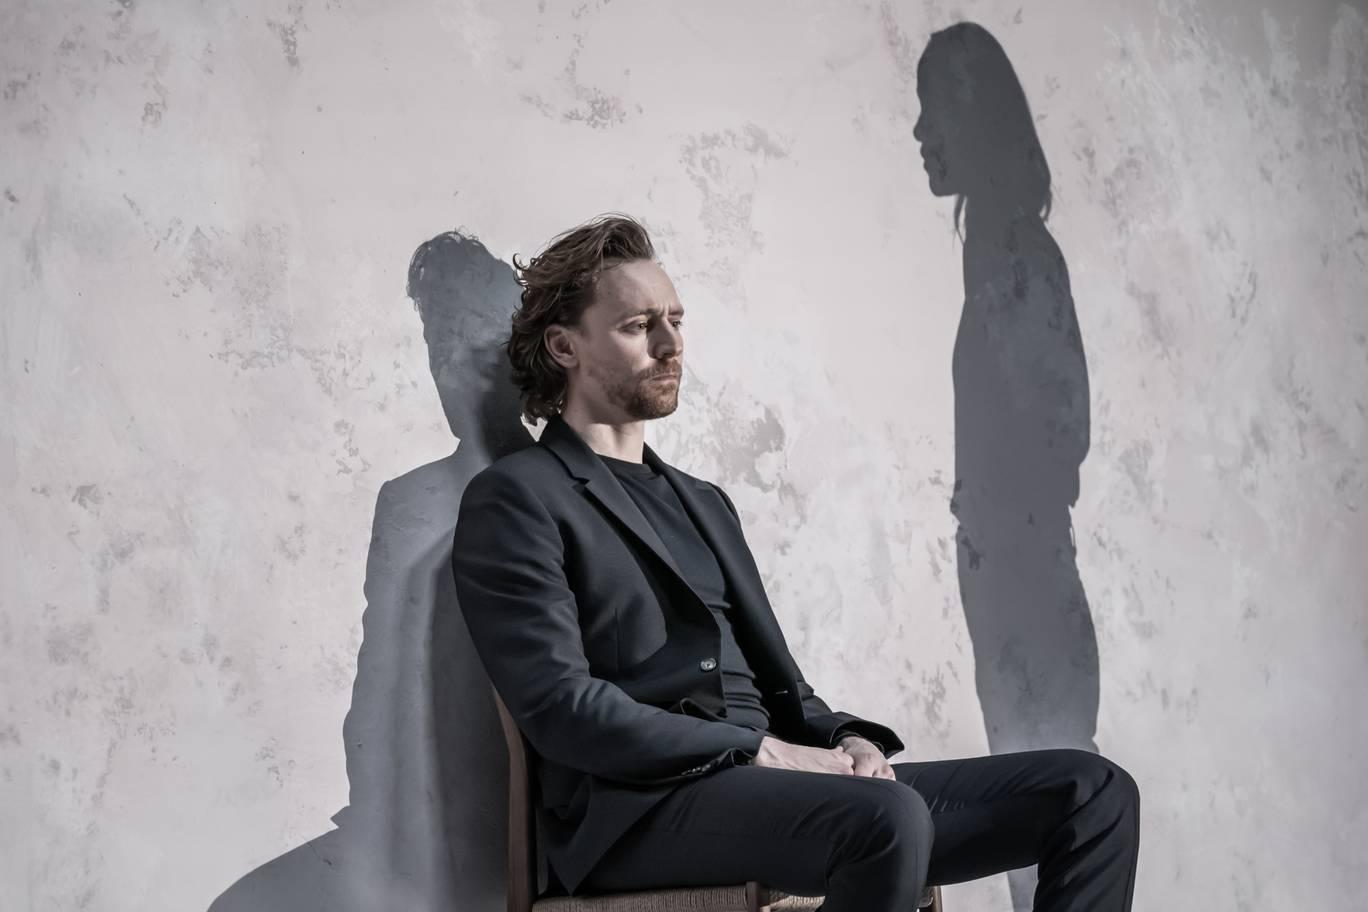 Tom-Hiddleston-in-'Betrayal'.-Photo-credit-Marc-Brenner-0.jpg